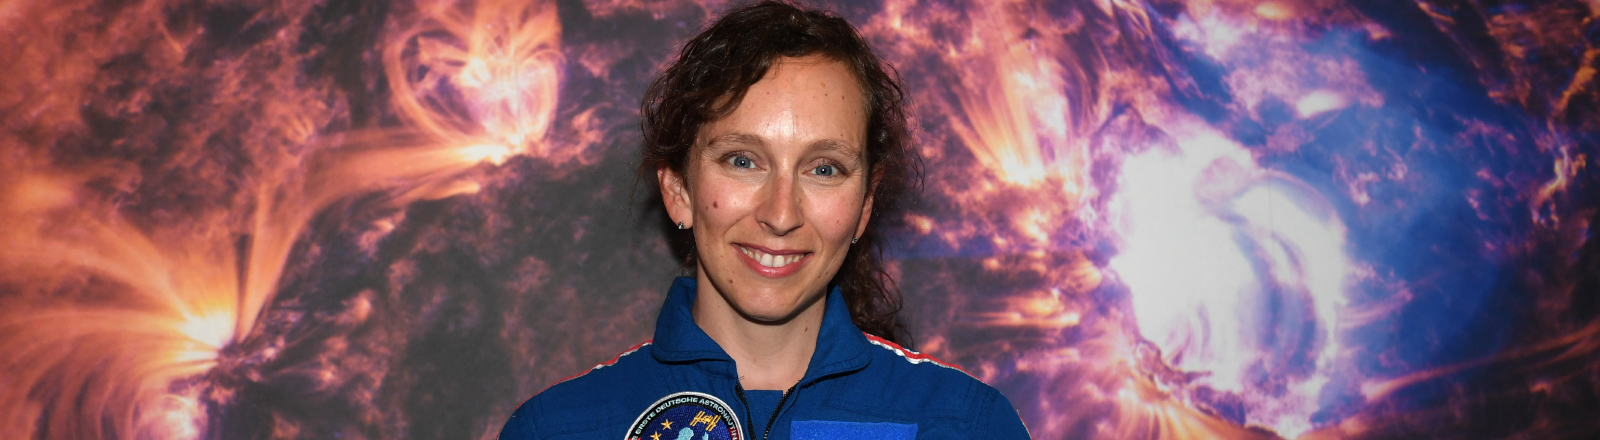 Die Astronautin Suzanna Randall